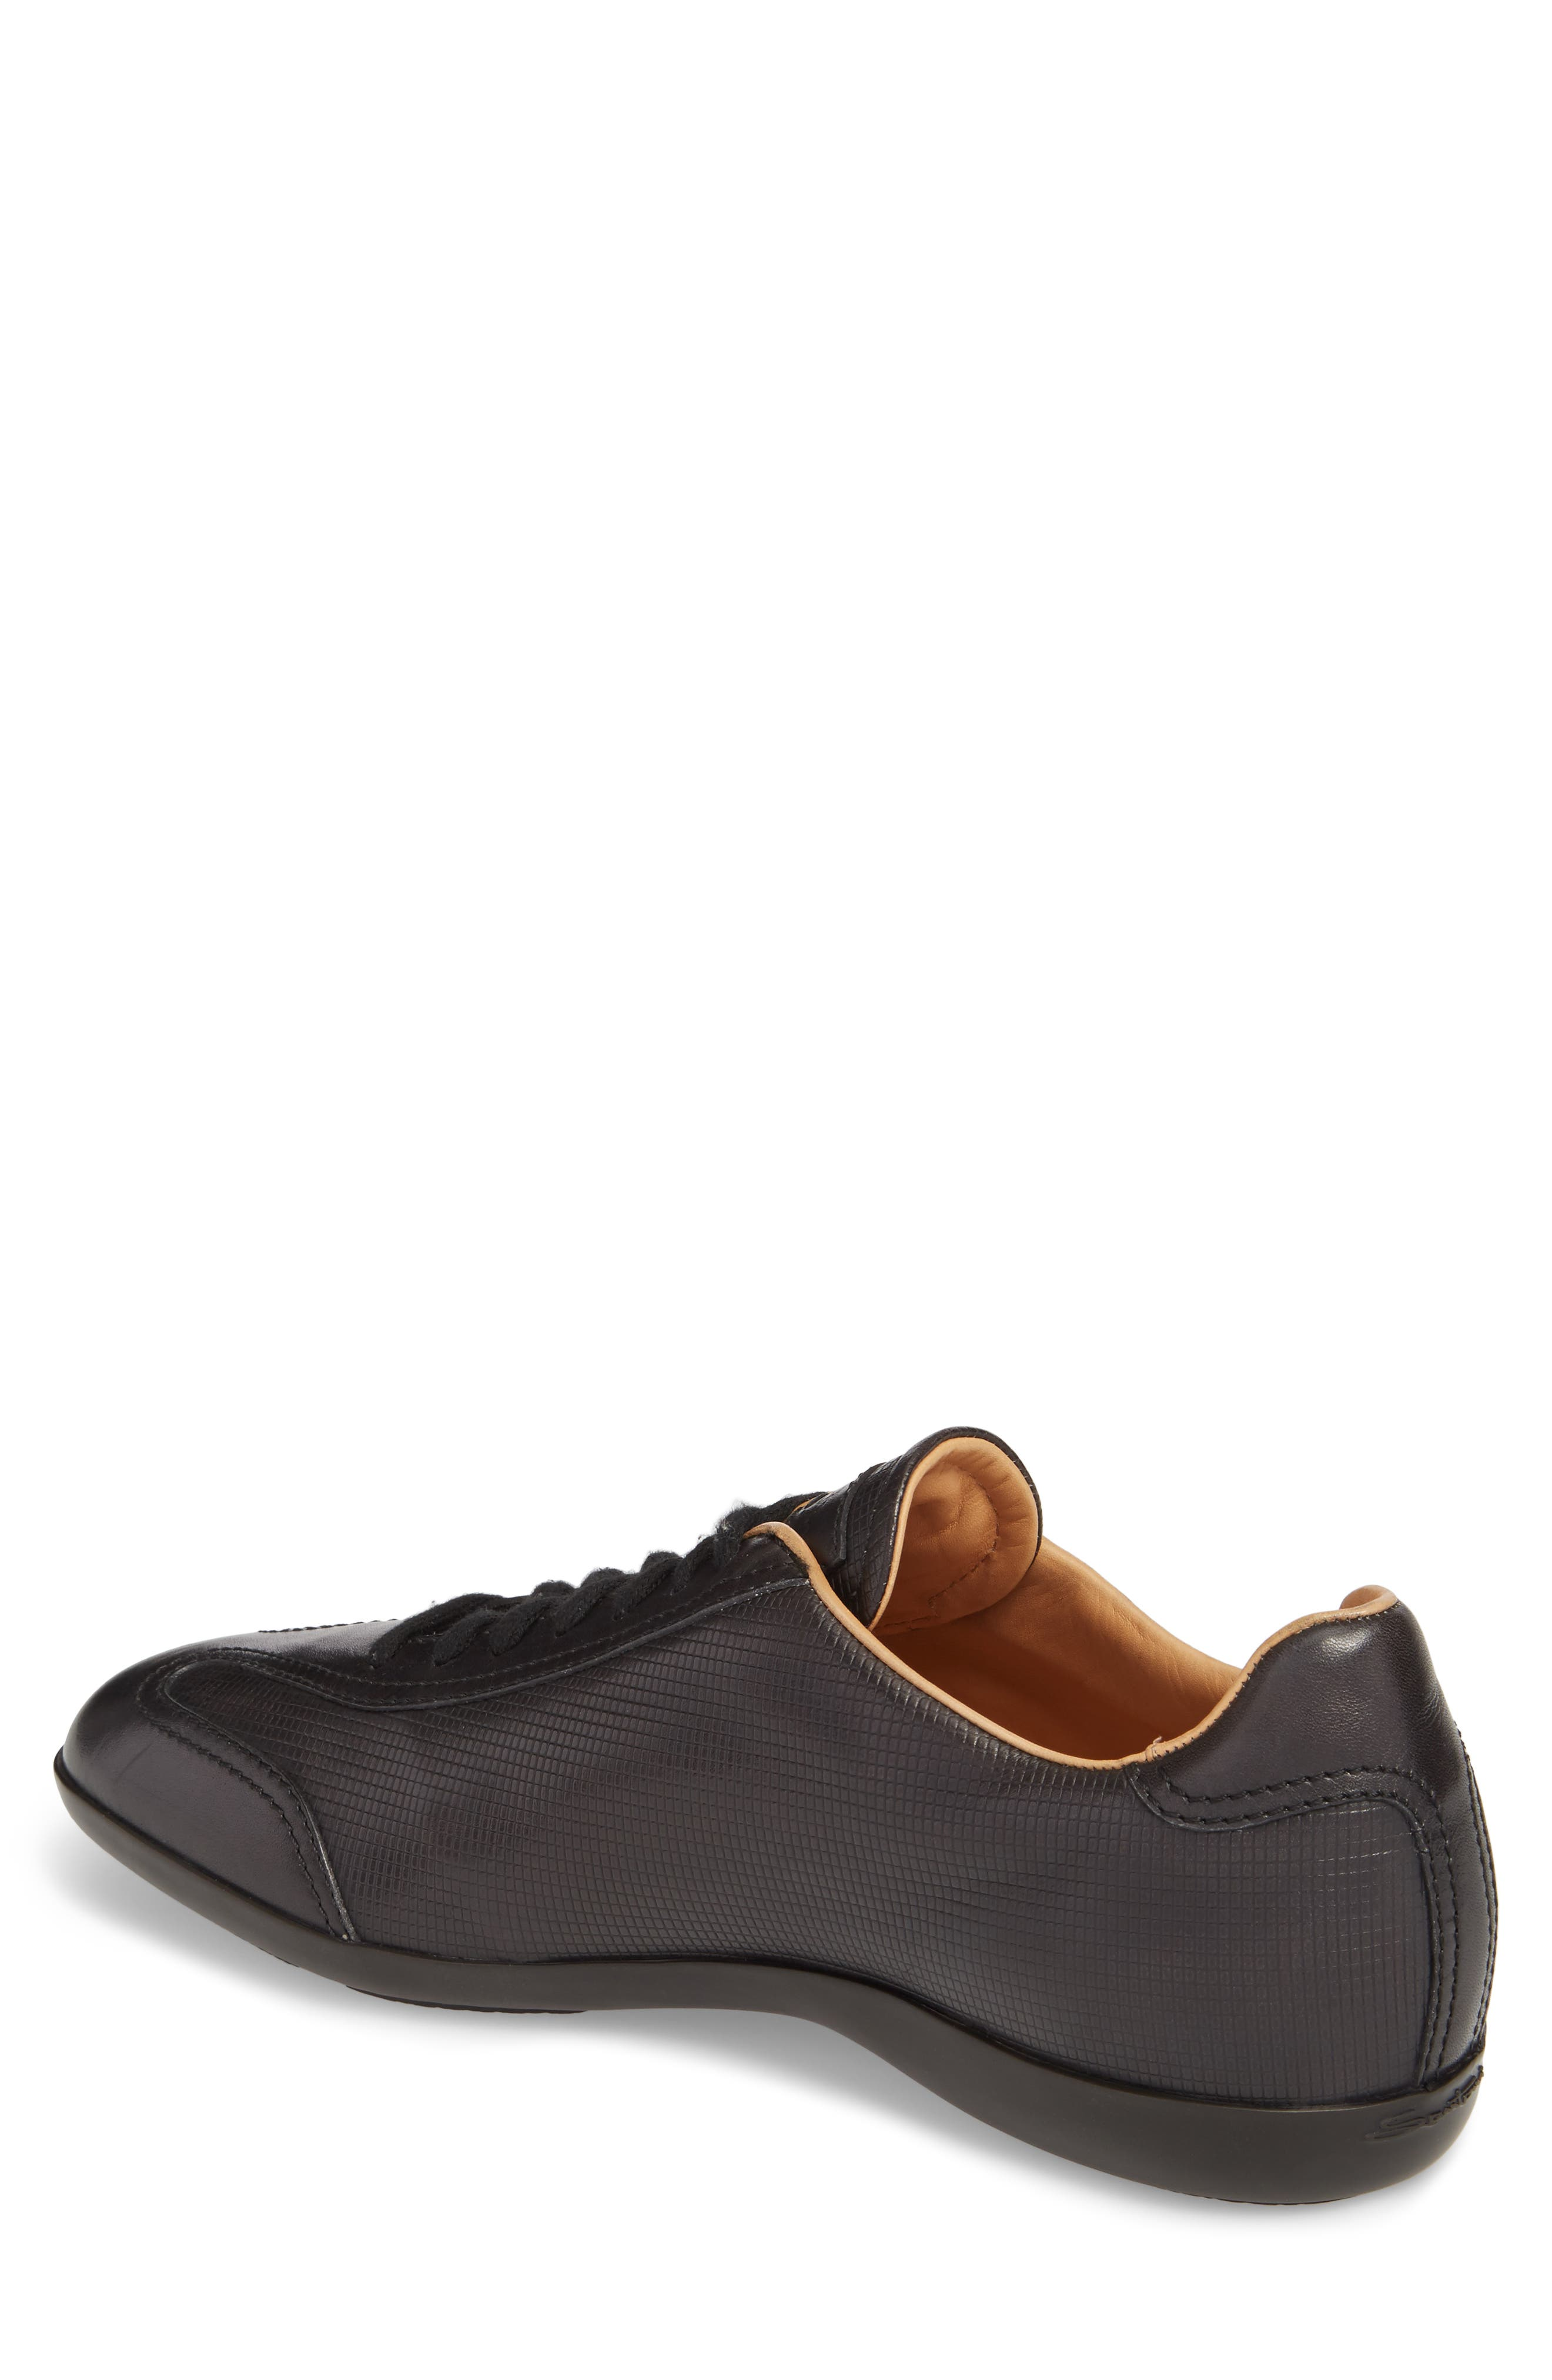 'Cortez' Sneaker,                             Alternate thumbnail 2, color,                             Brown Leather